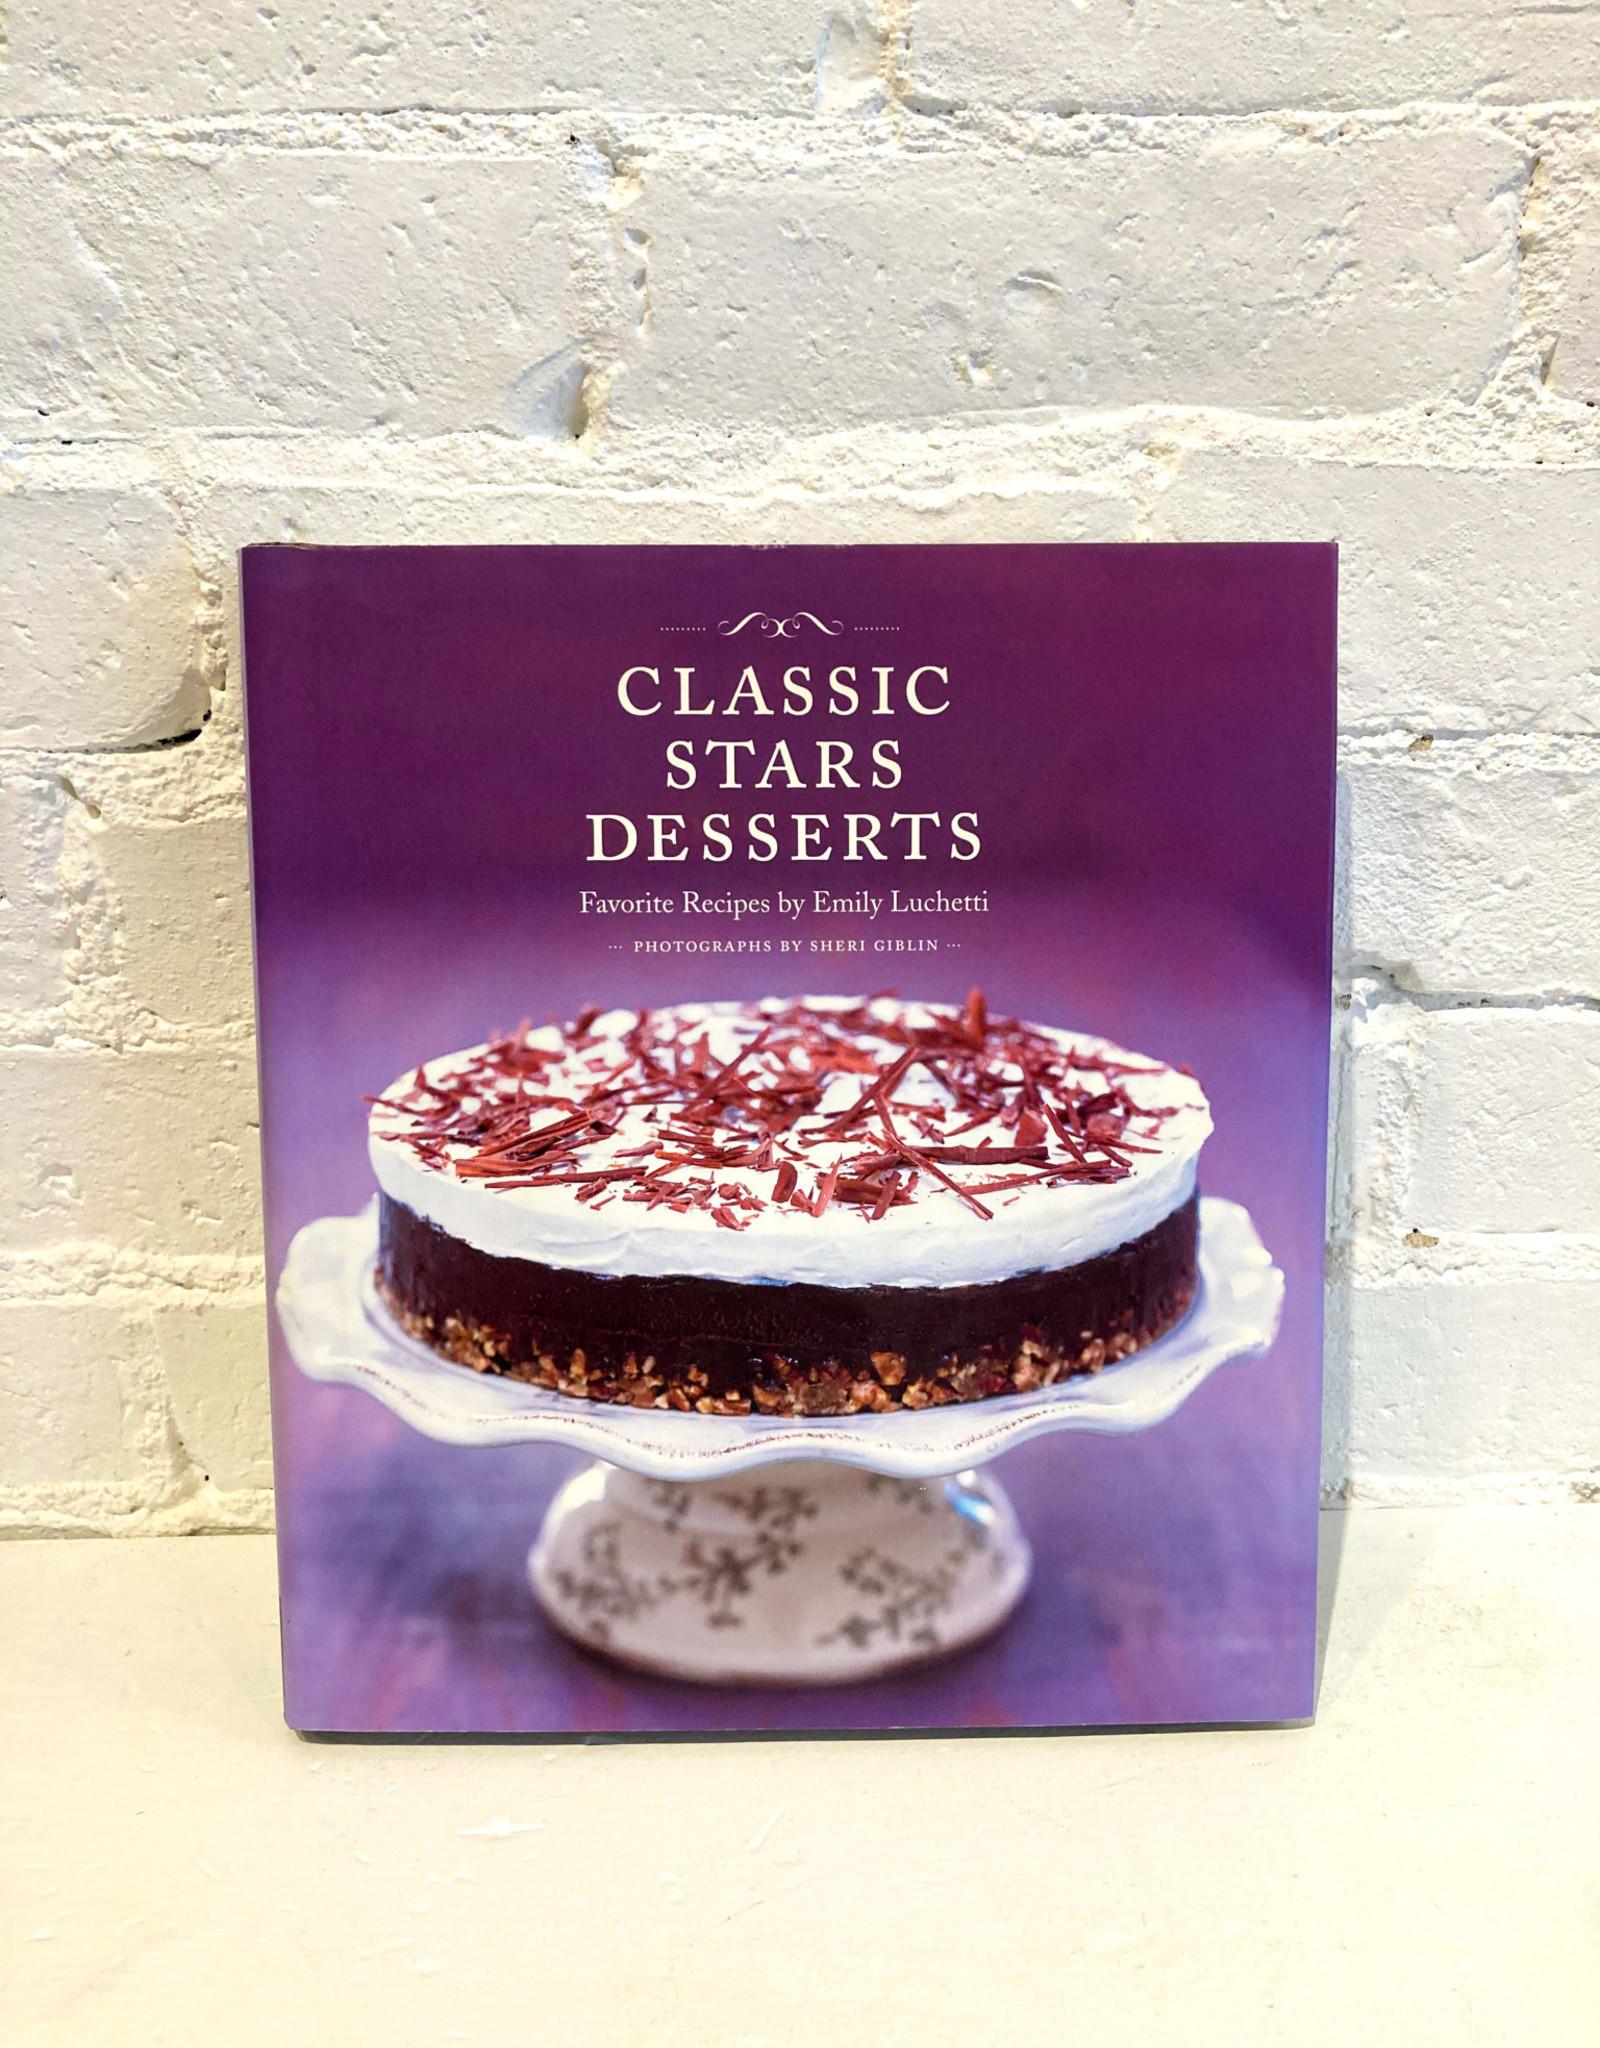 Classic Stars Desserts by Emily Luchetti